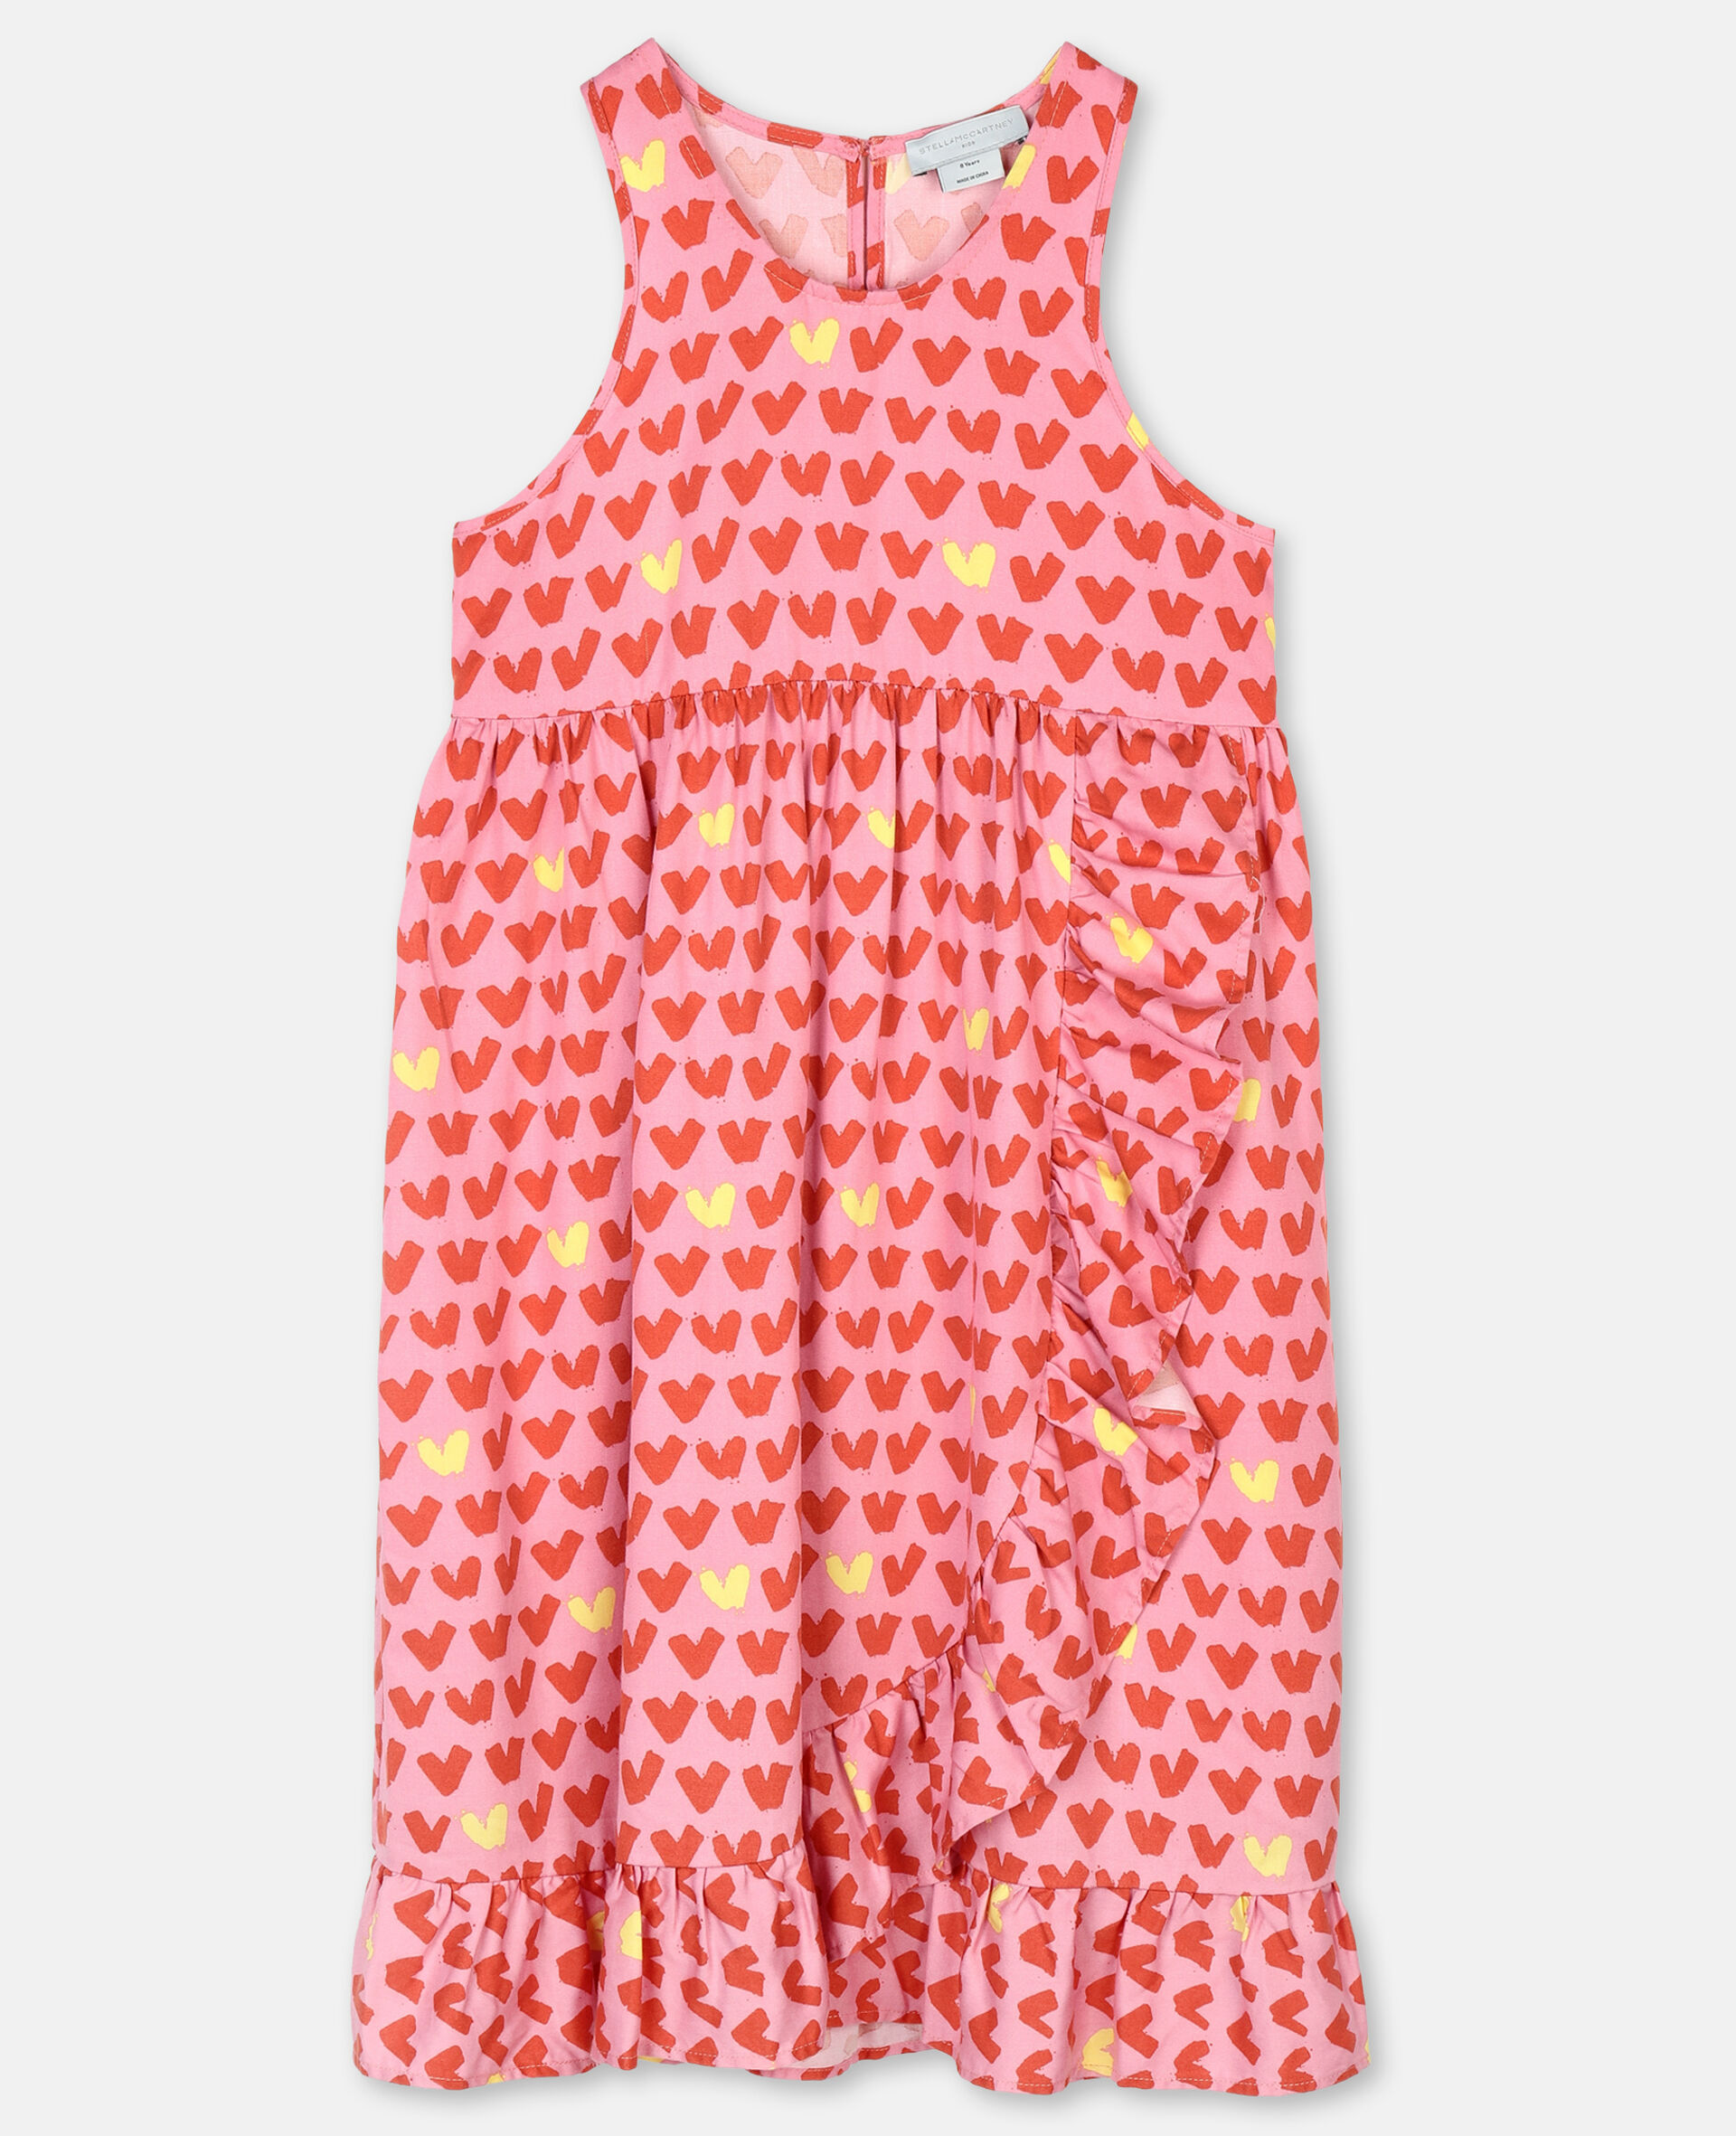 Hearts 粘胶纤维斜纹布连衣裙-粉色-large image number 0